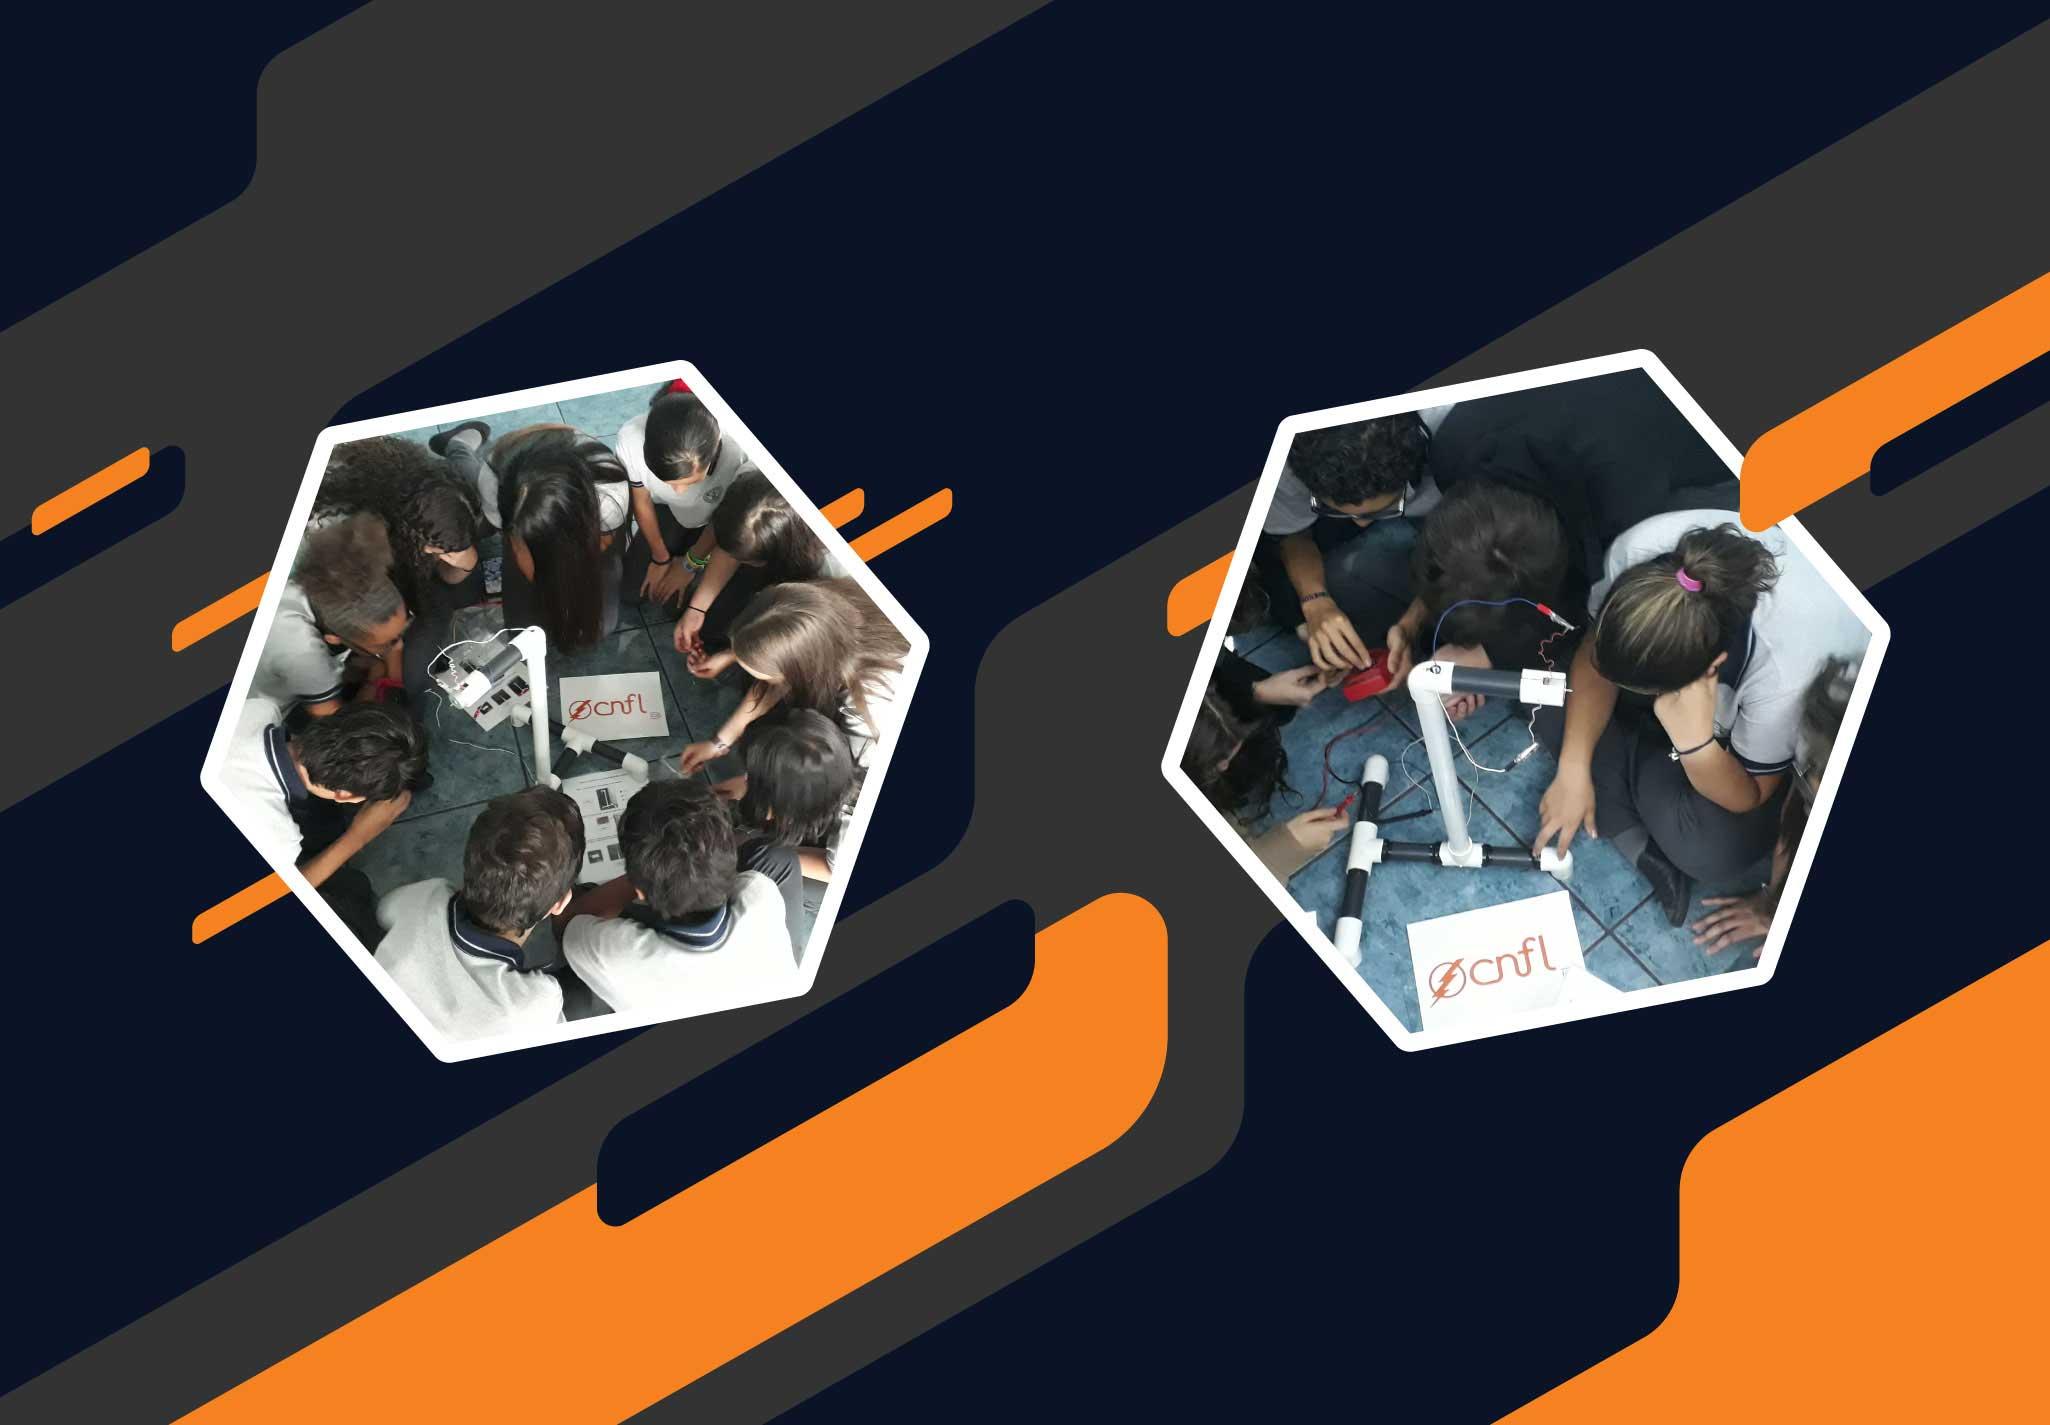 Dos grupos de estudiantes construyendo un aerogenerador a escala